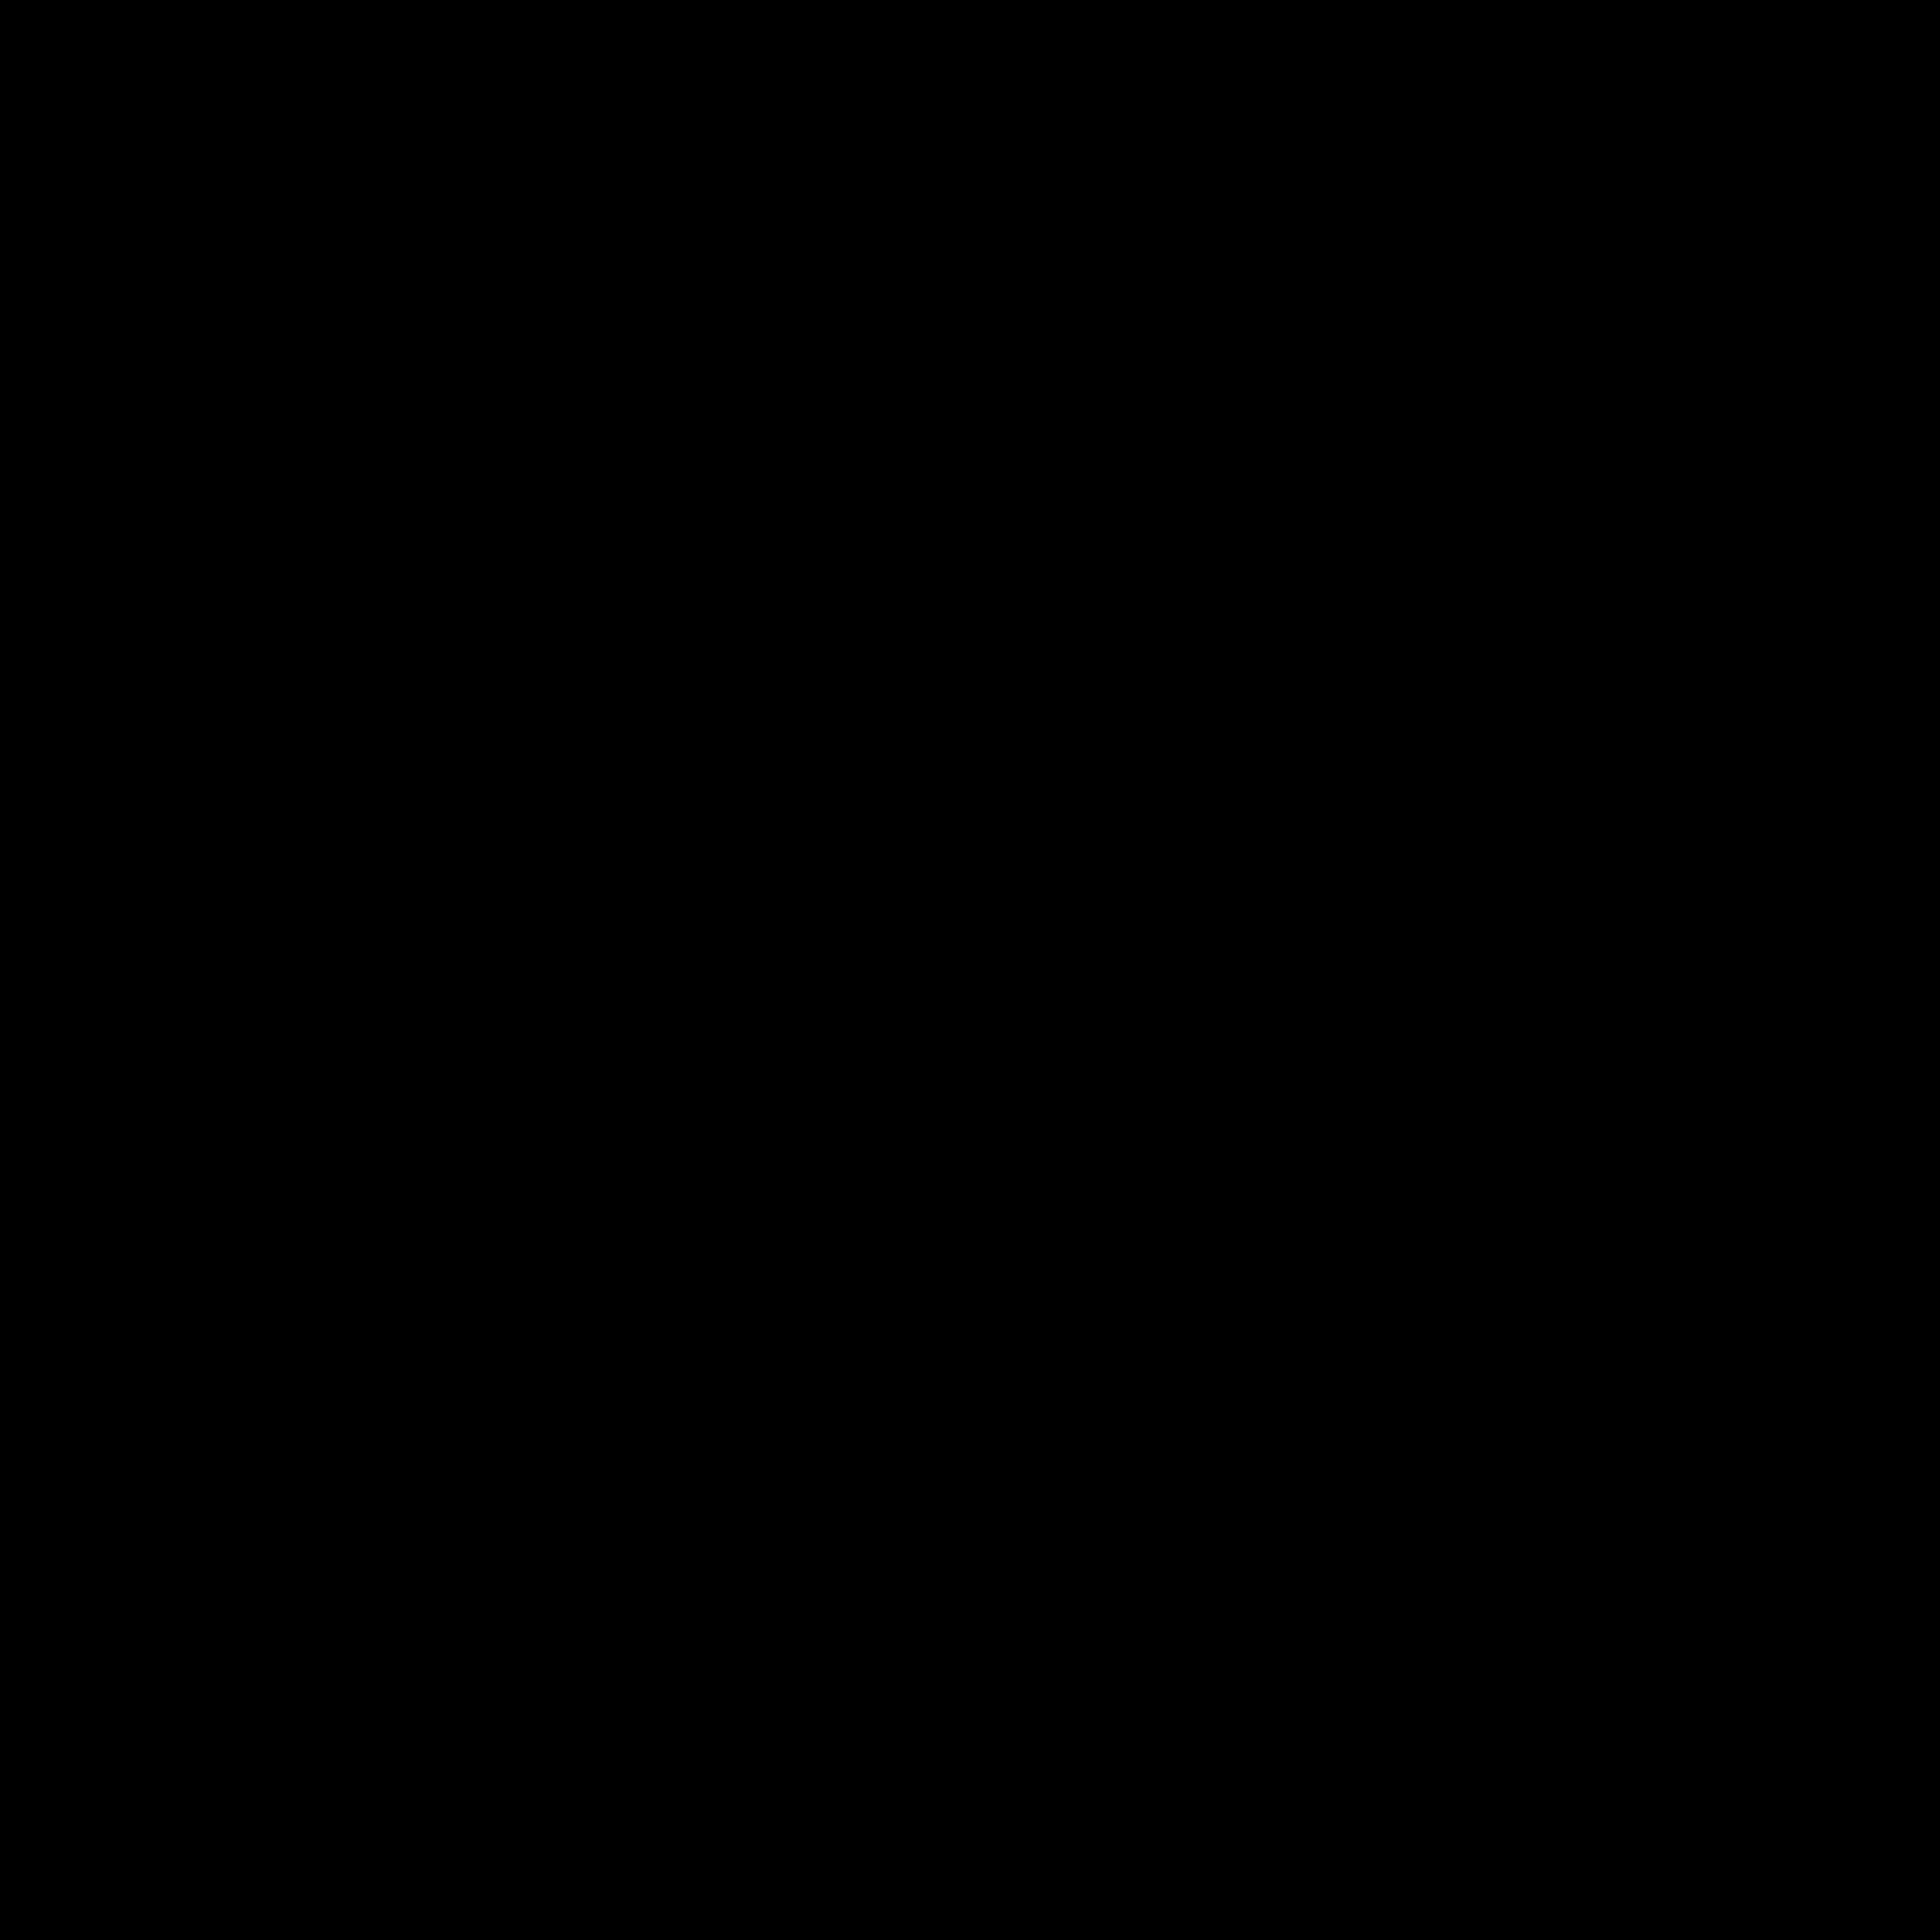 QR-Code-Symbol